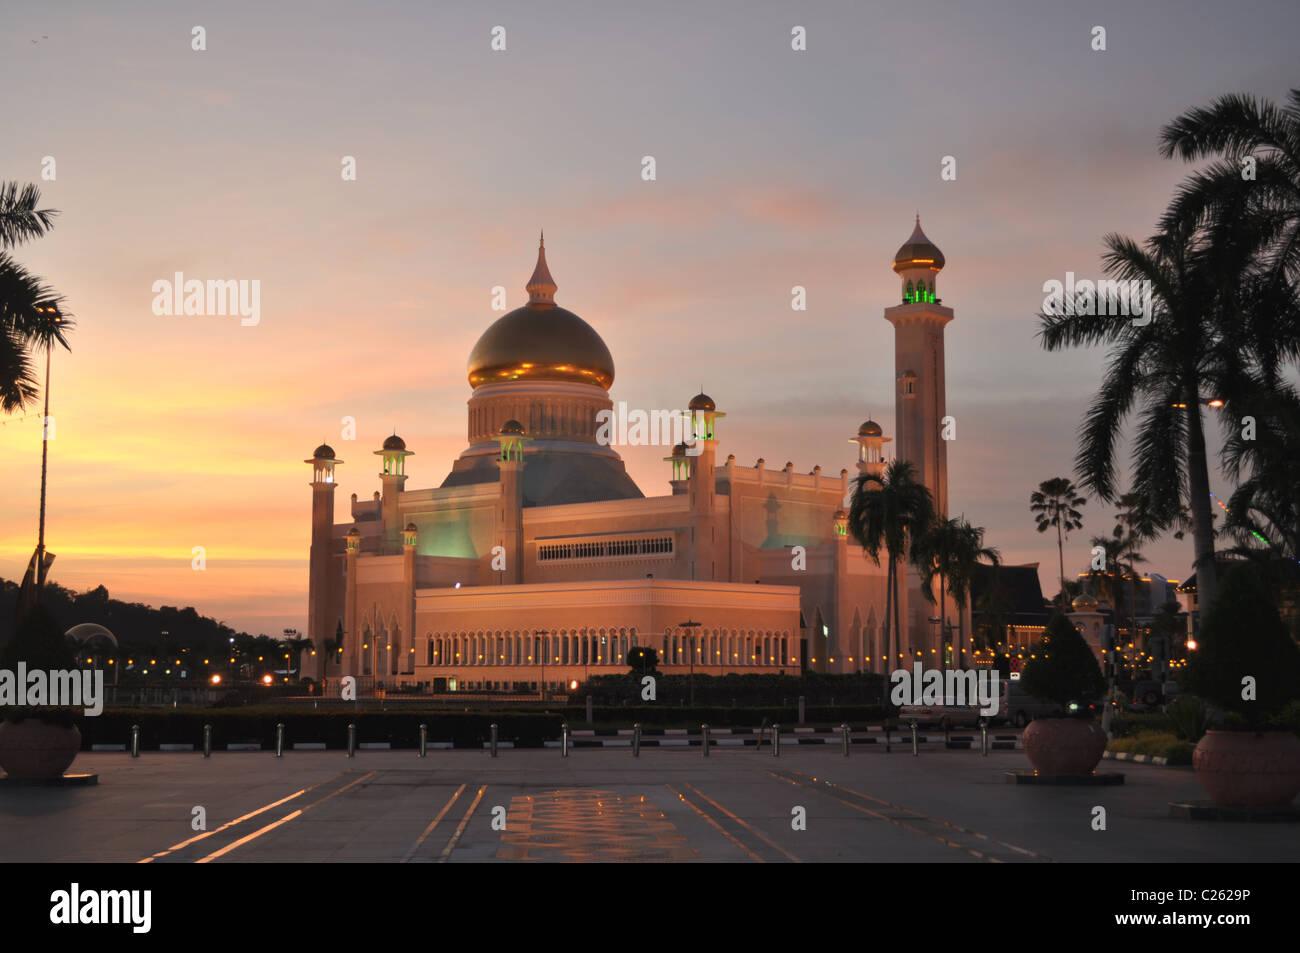 Omar Ali Mosque - Stock Image